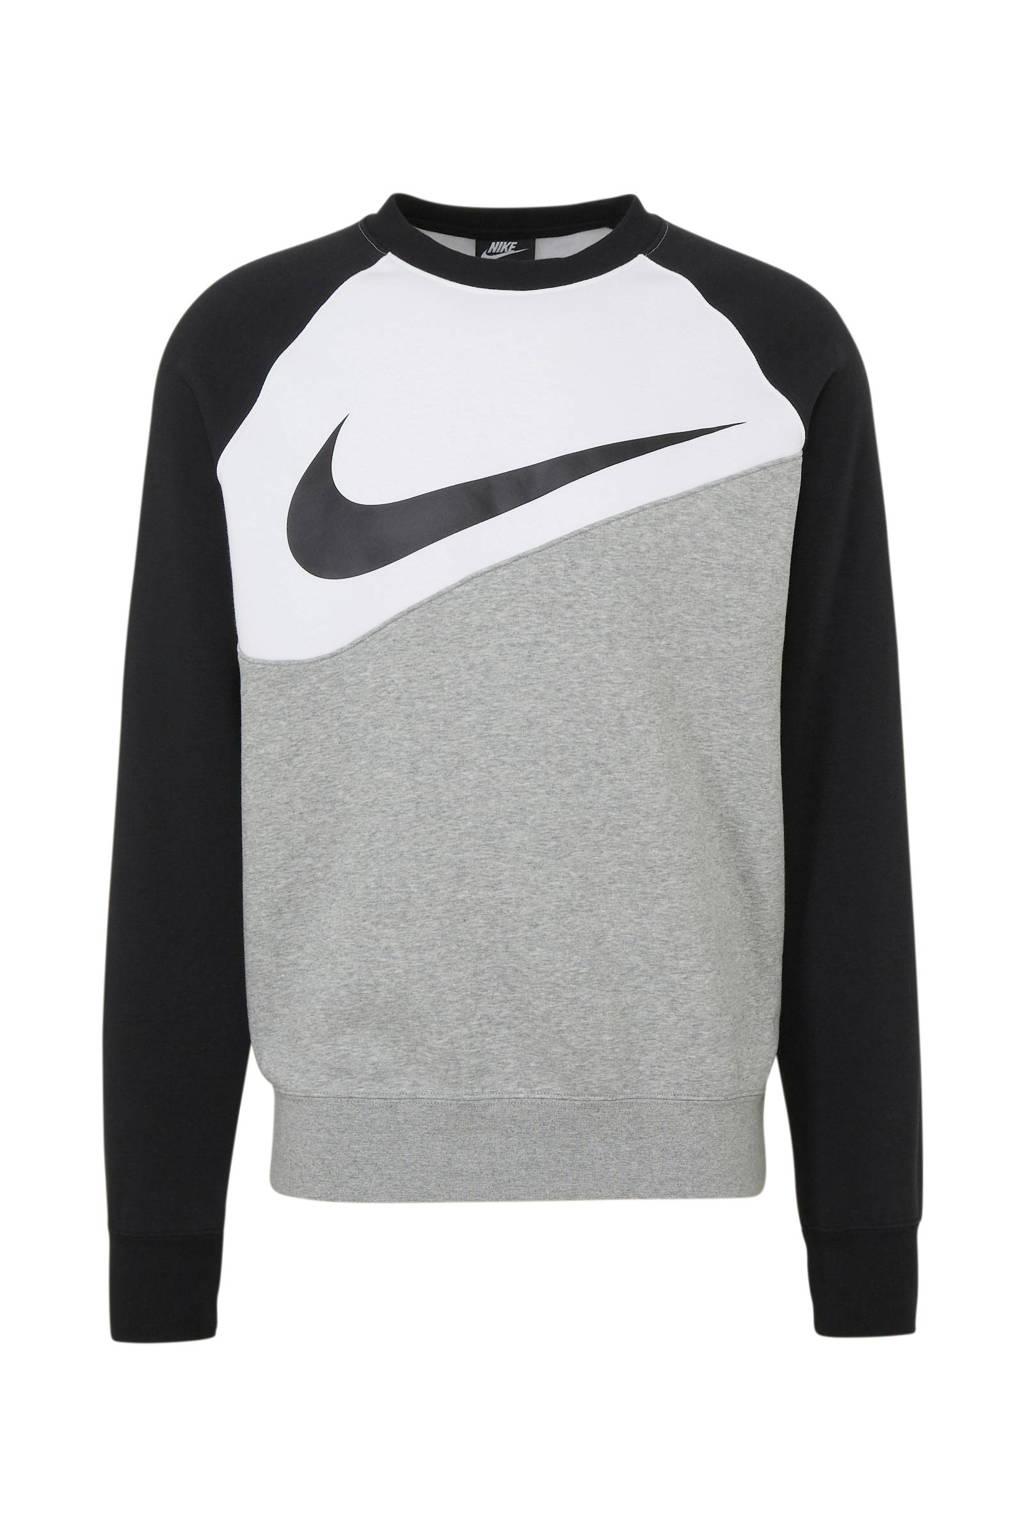 Nike   sweater grijs melange, Grijs melange/zwart/wit